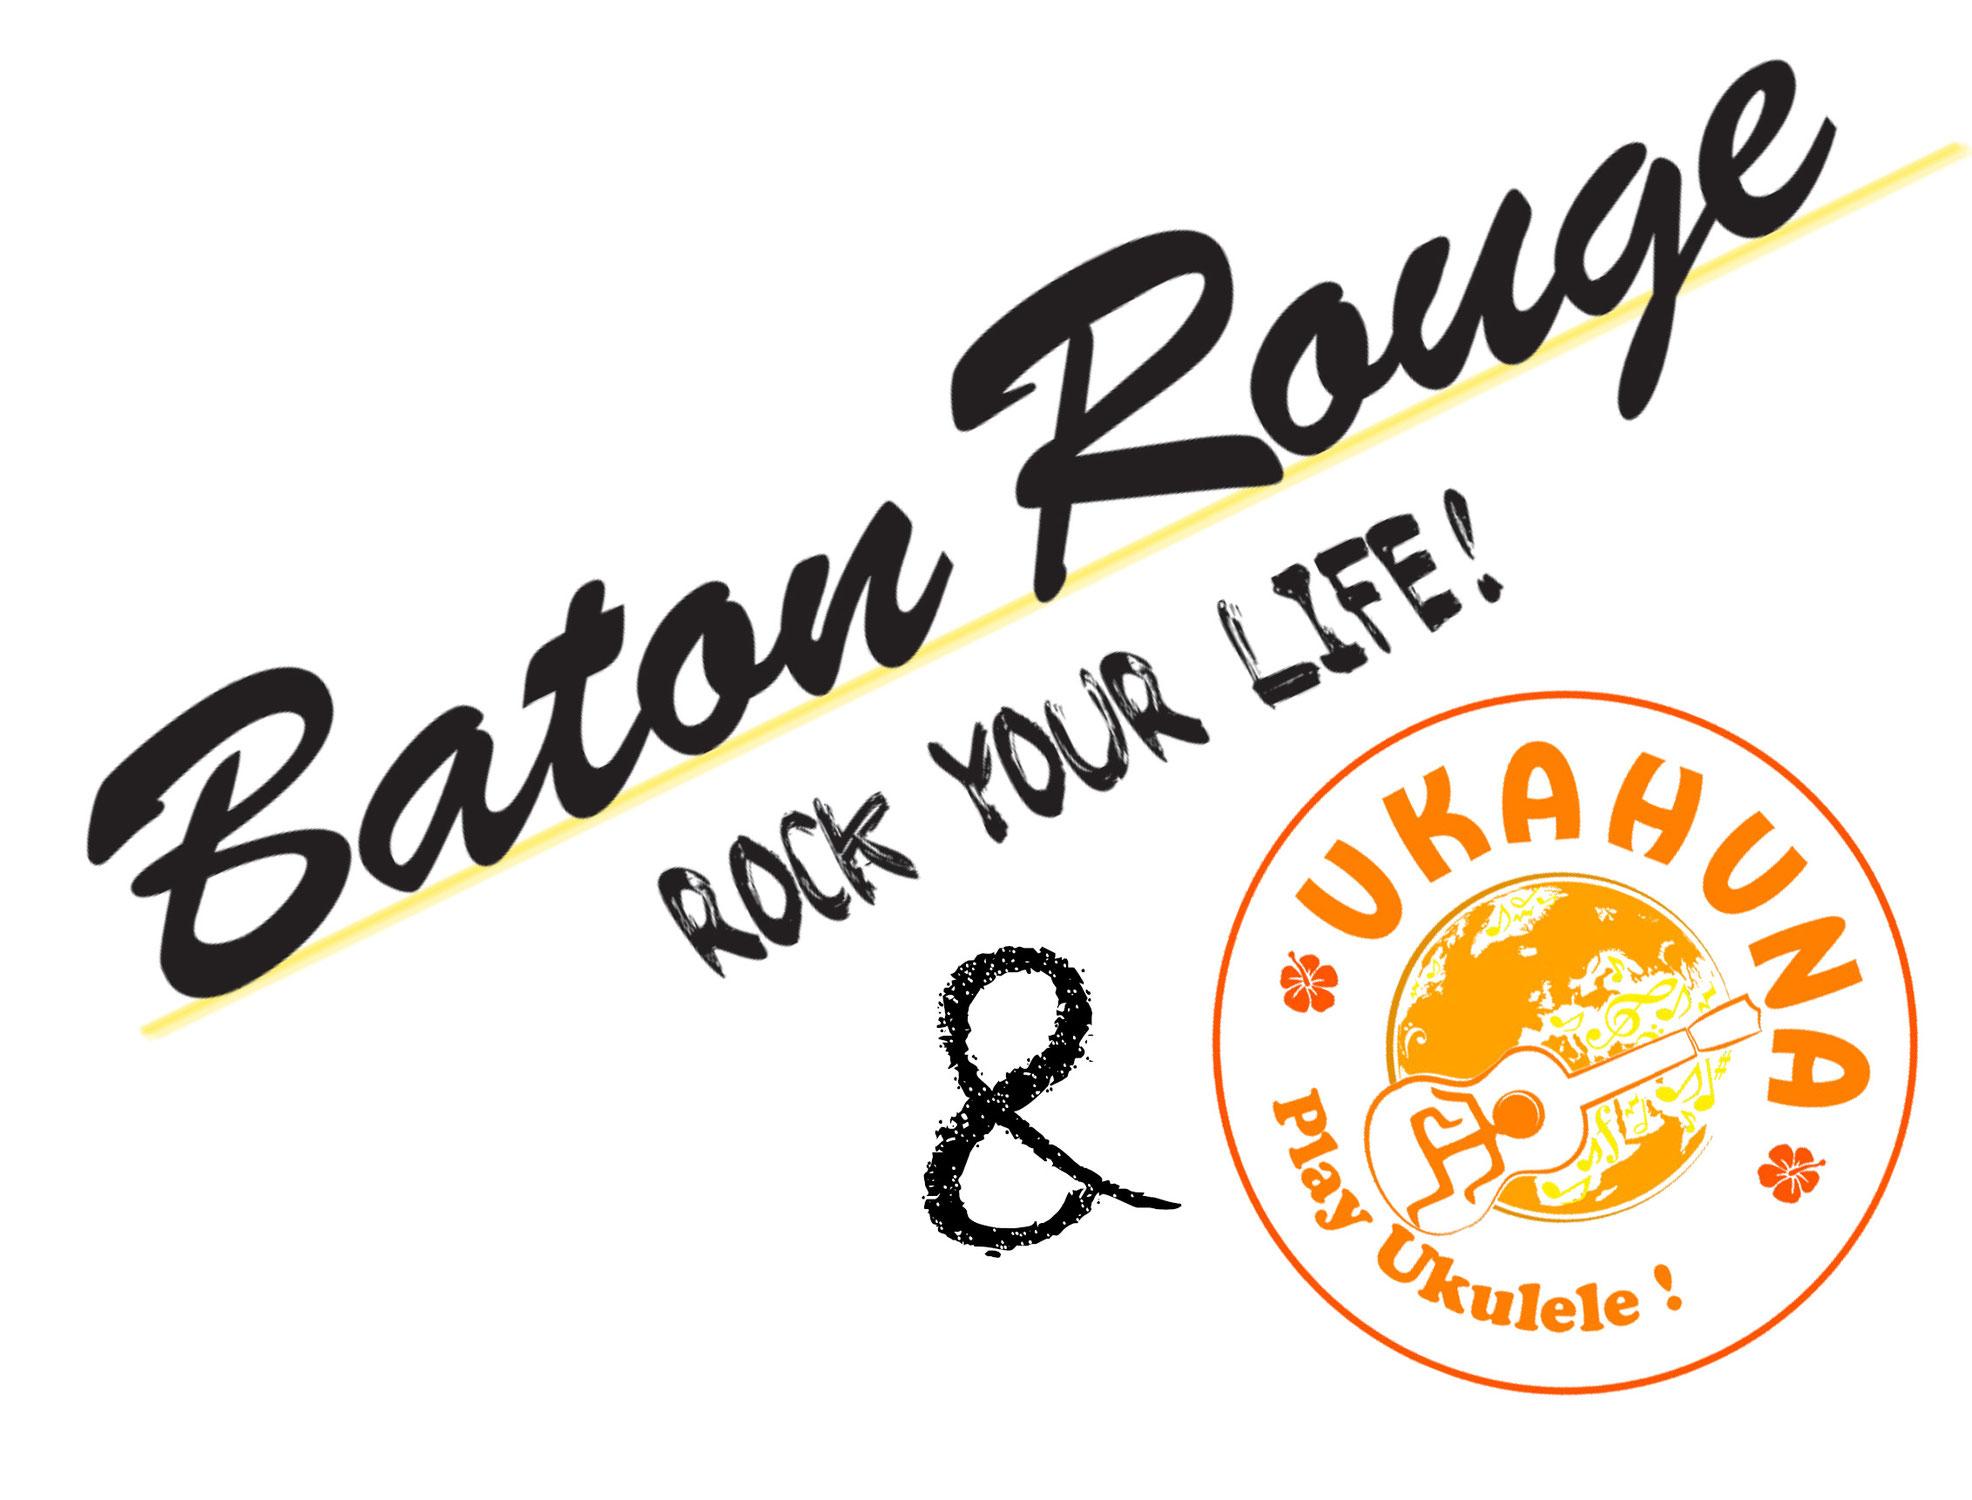 Ukahuna is sponsored by Baton Rouge